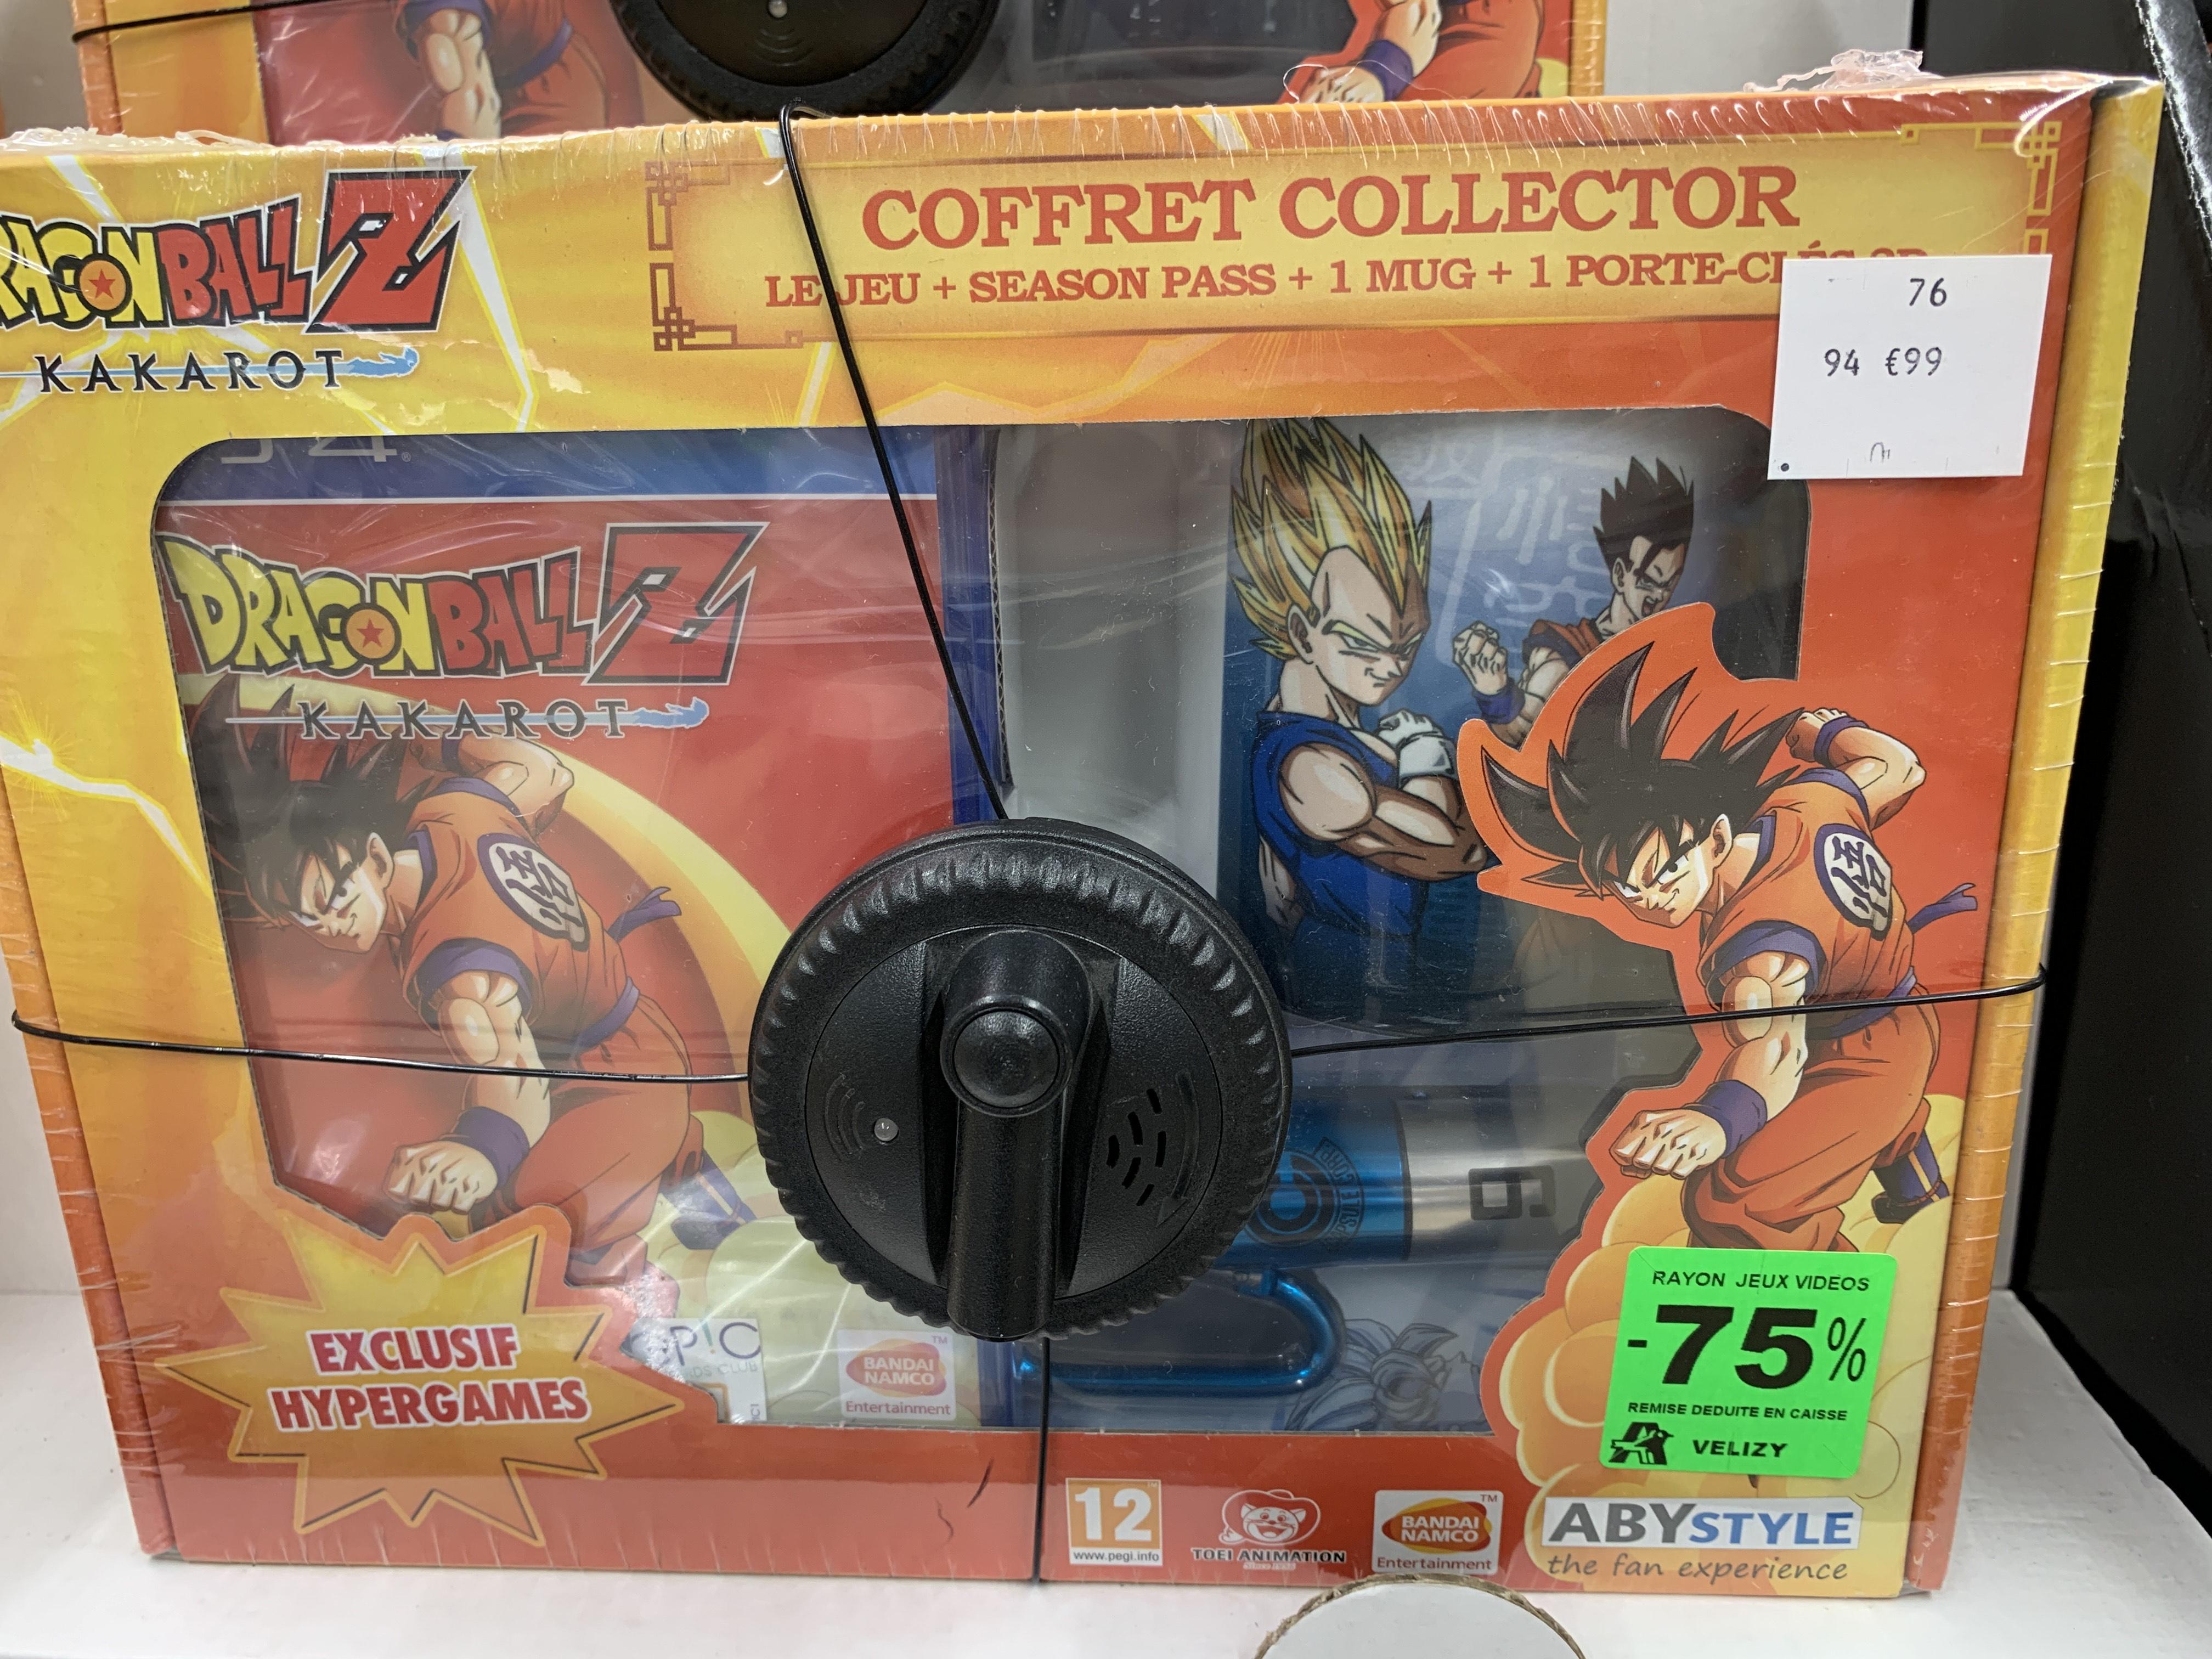 Coffret Collector Dragon Ball Z Kakarot sur PS4 - Vélizy 2 (78)